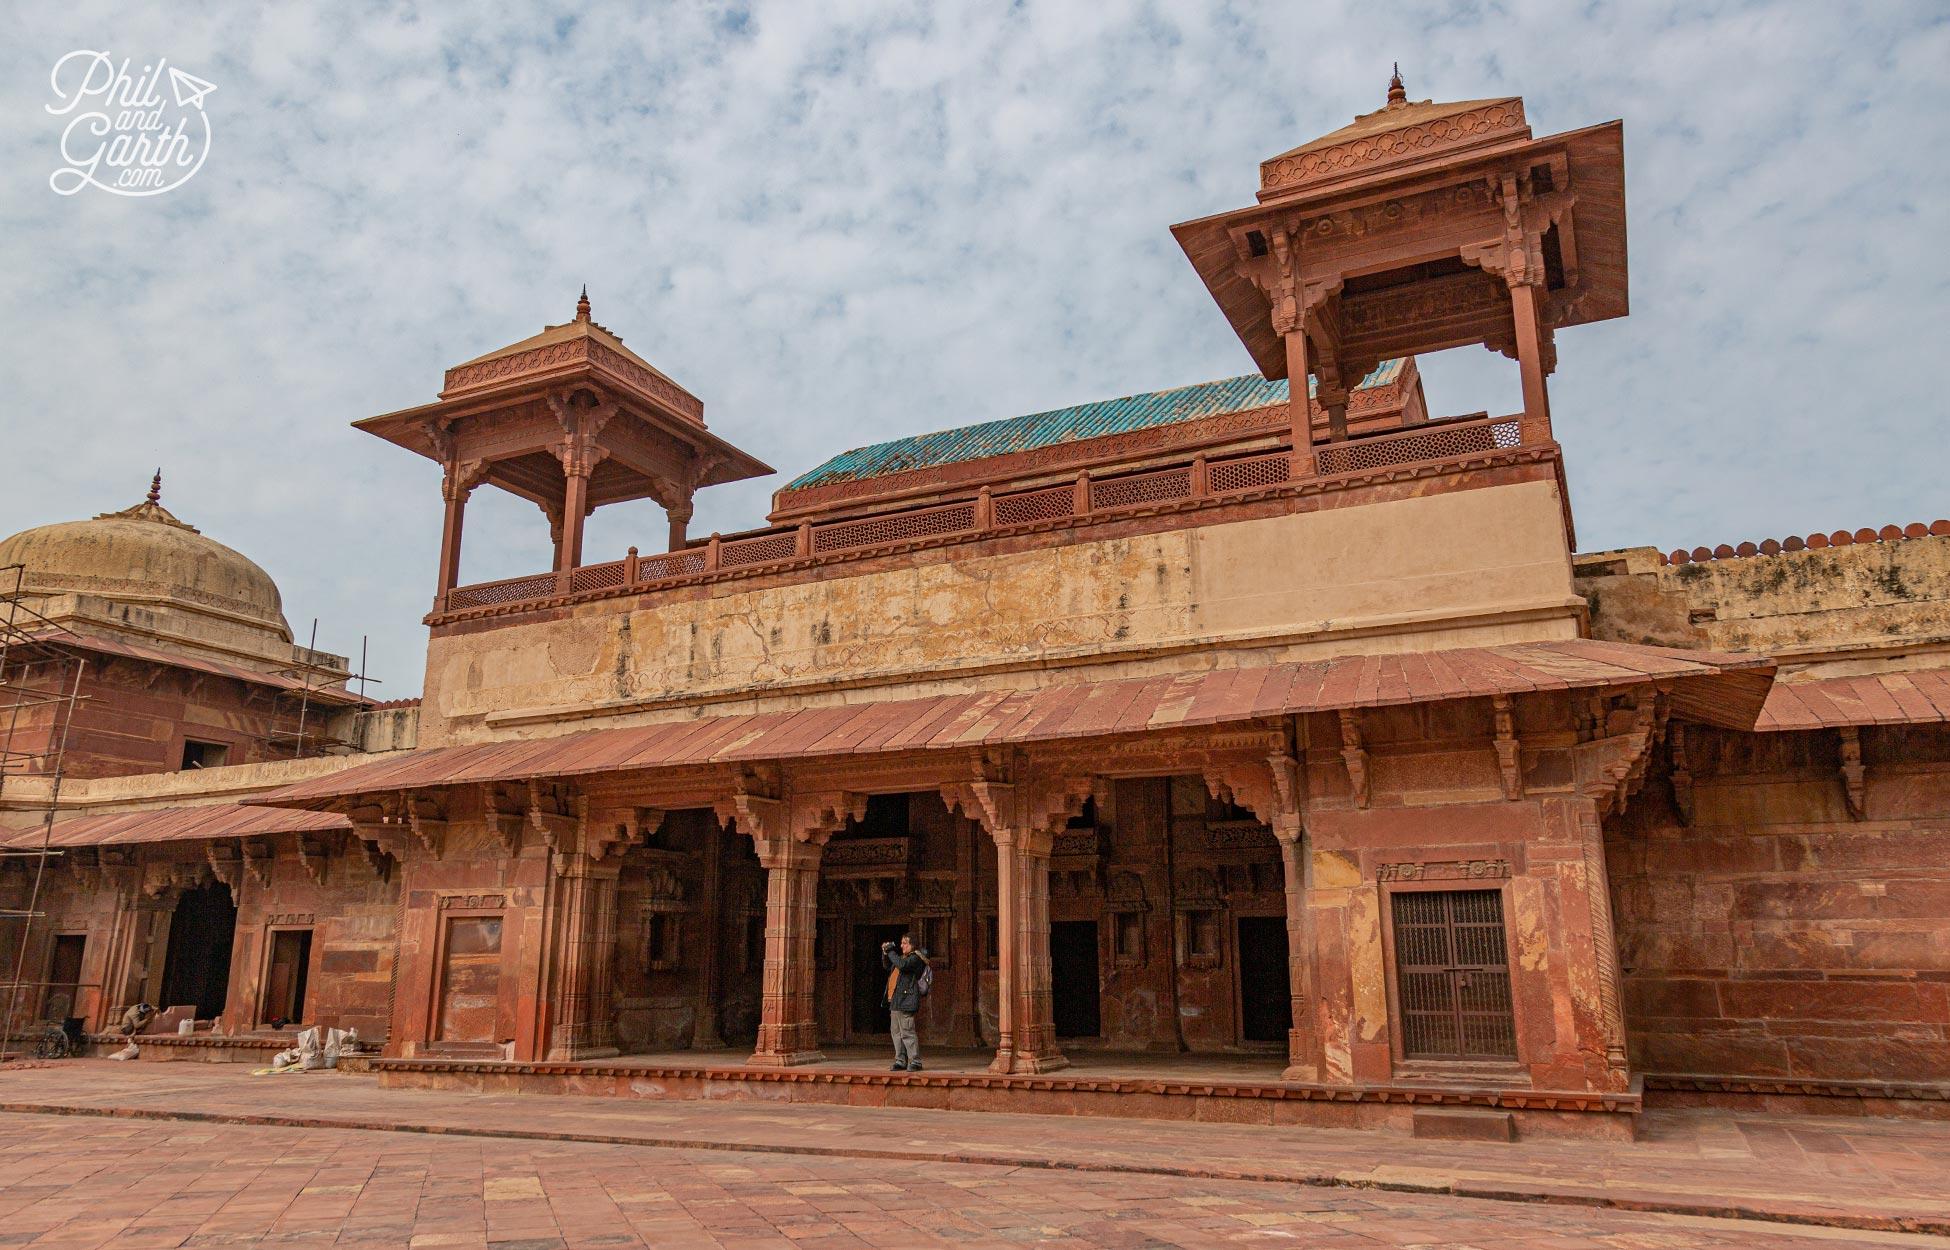 The Jodha Bai Palace built for the Emperor's favourite wife Jodha Bai